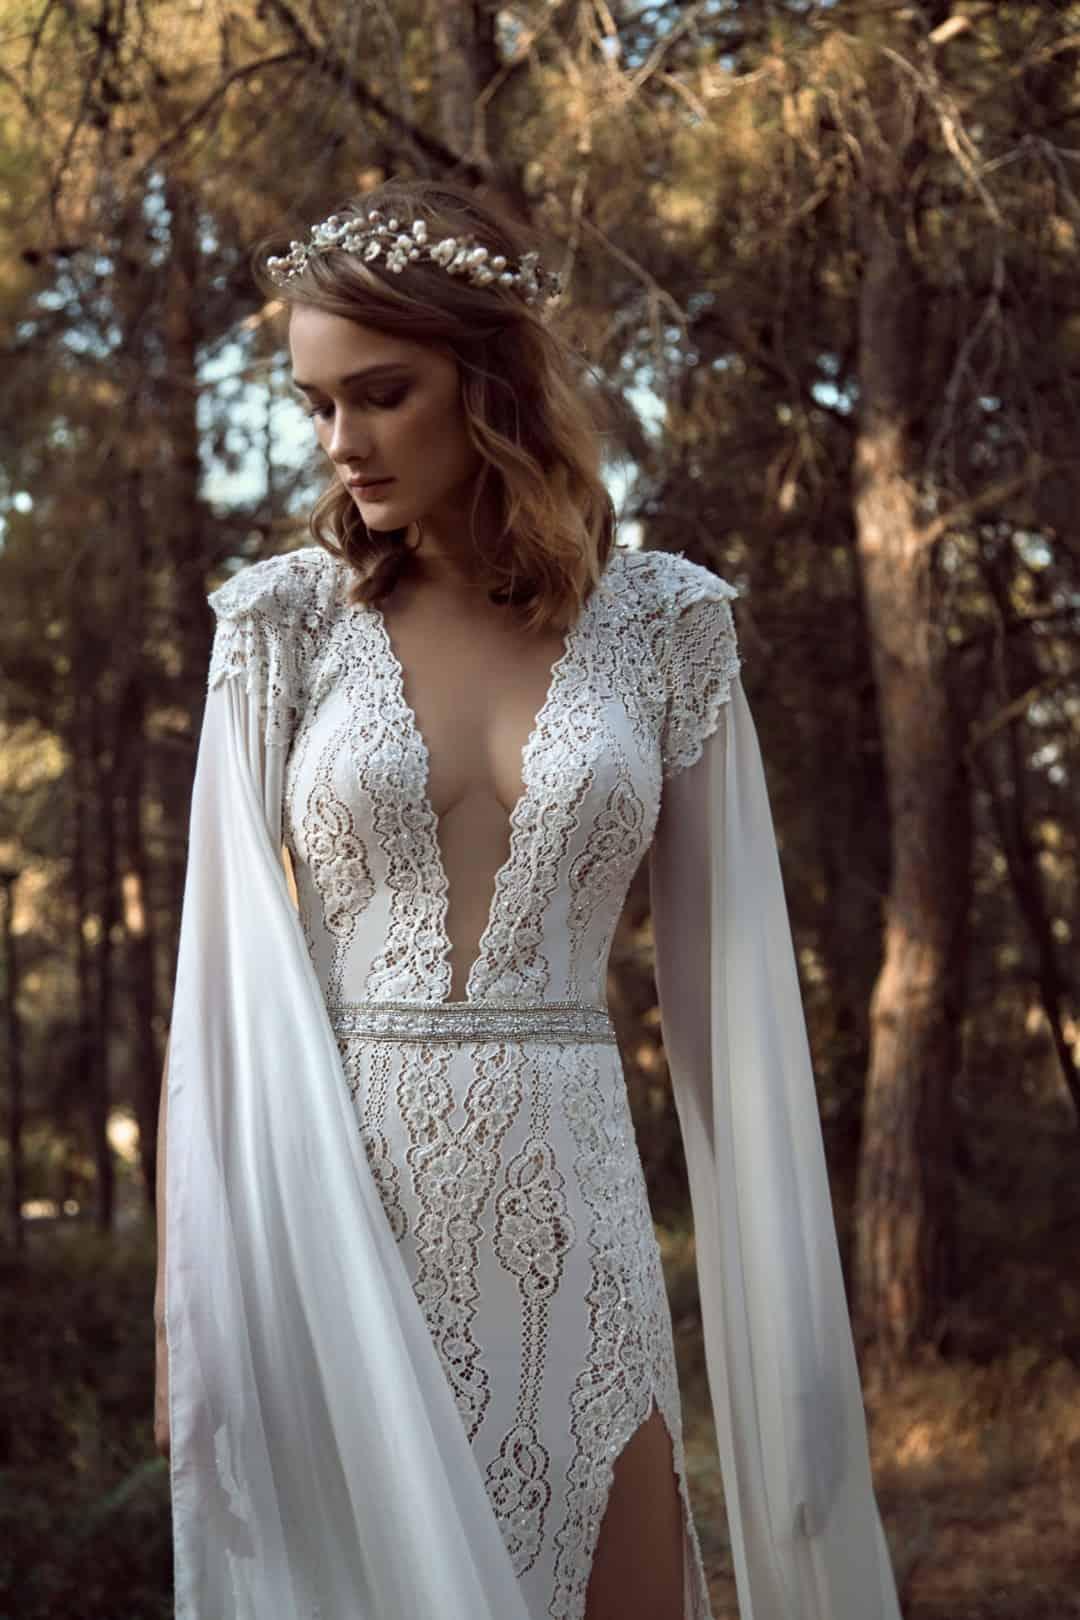 Haute Couture Wedding Dresses - 906_front_mediumshot